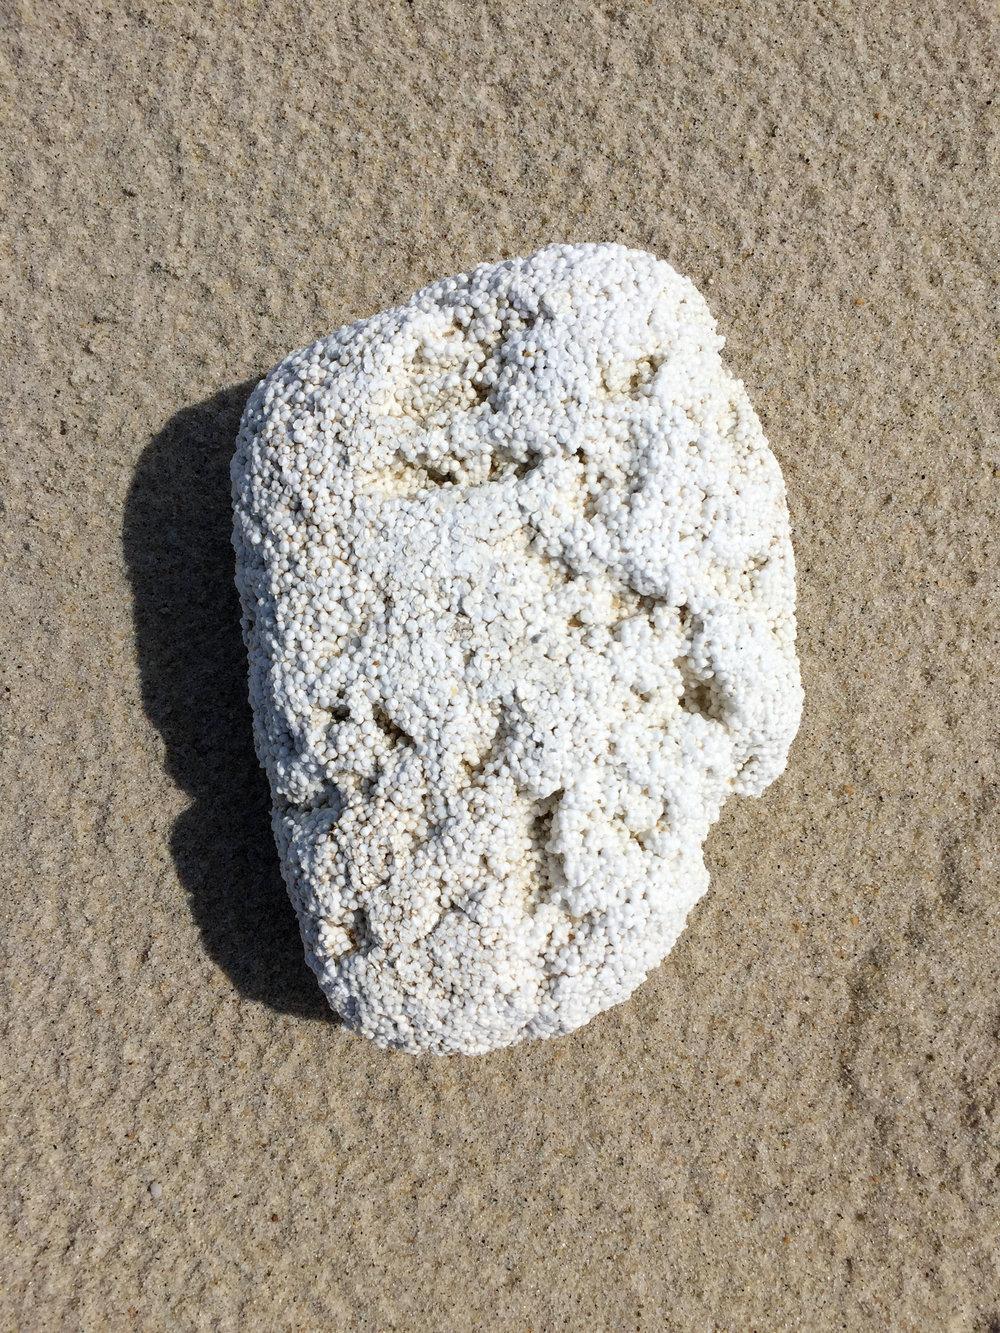 amy_chen_design_sandy_hook_beach_clean_styrofoam.JPG